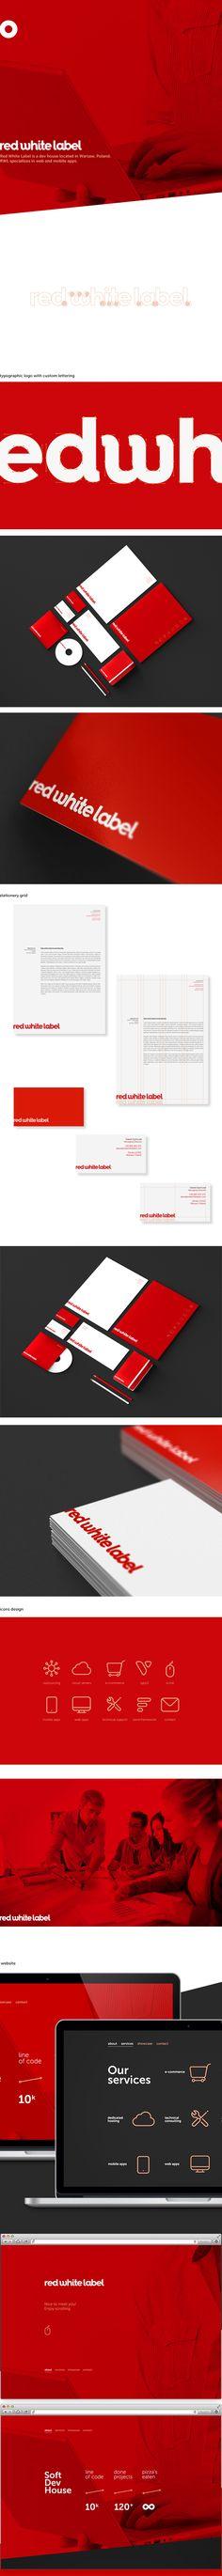 Red White Label on Branding Served